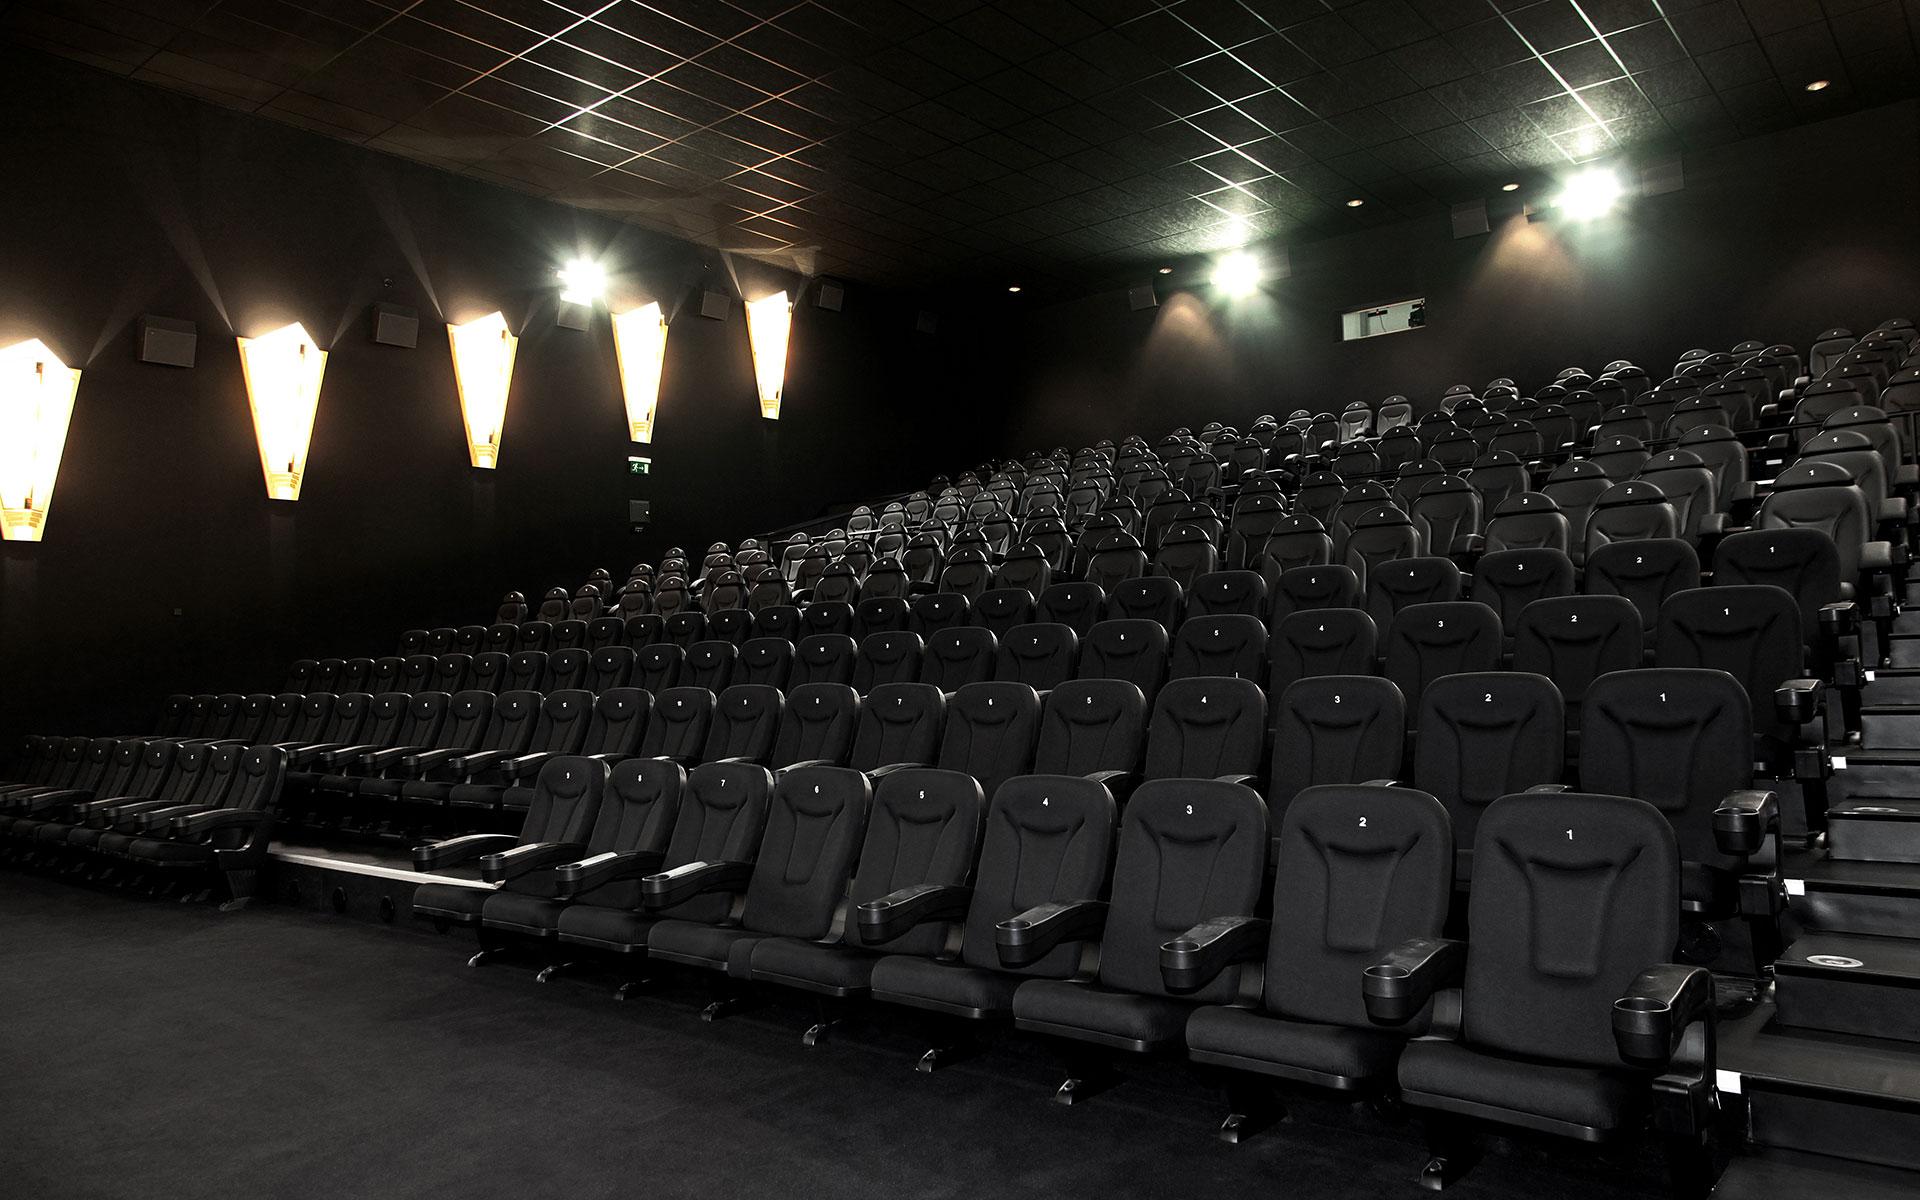 Das Lumen Kino